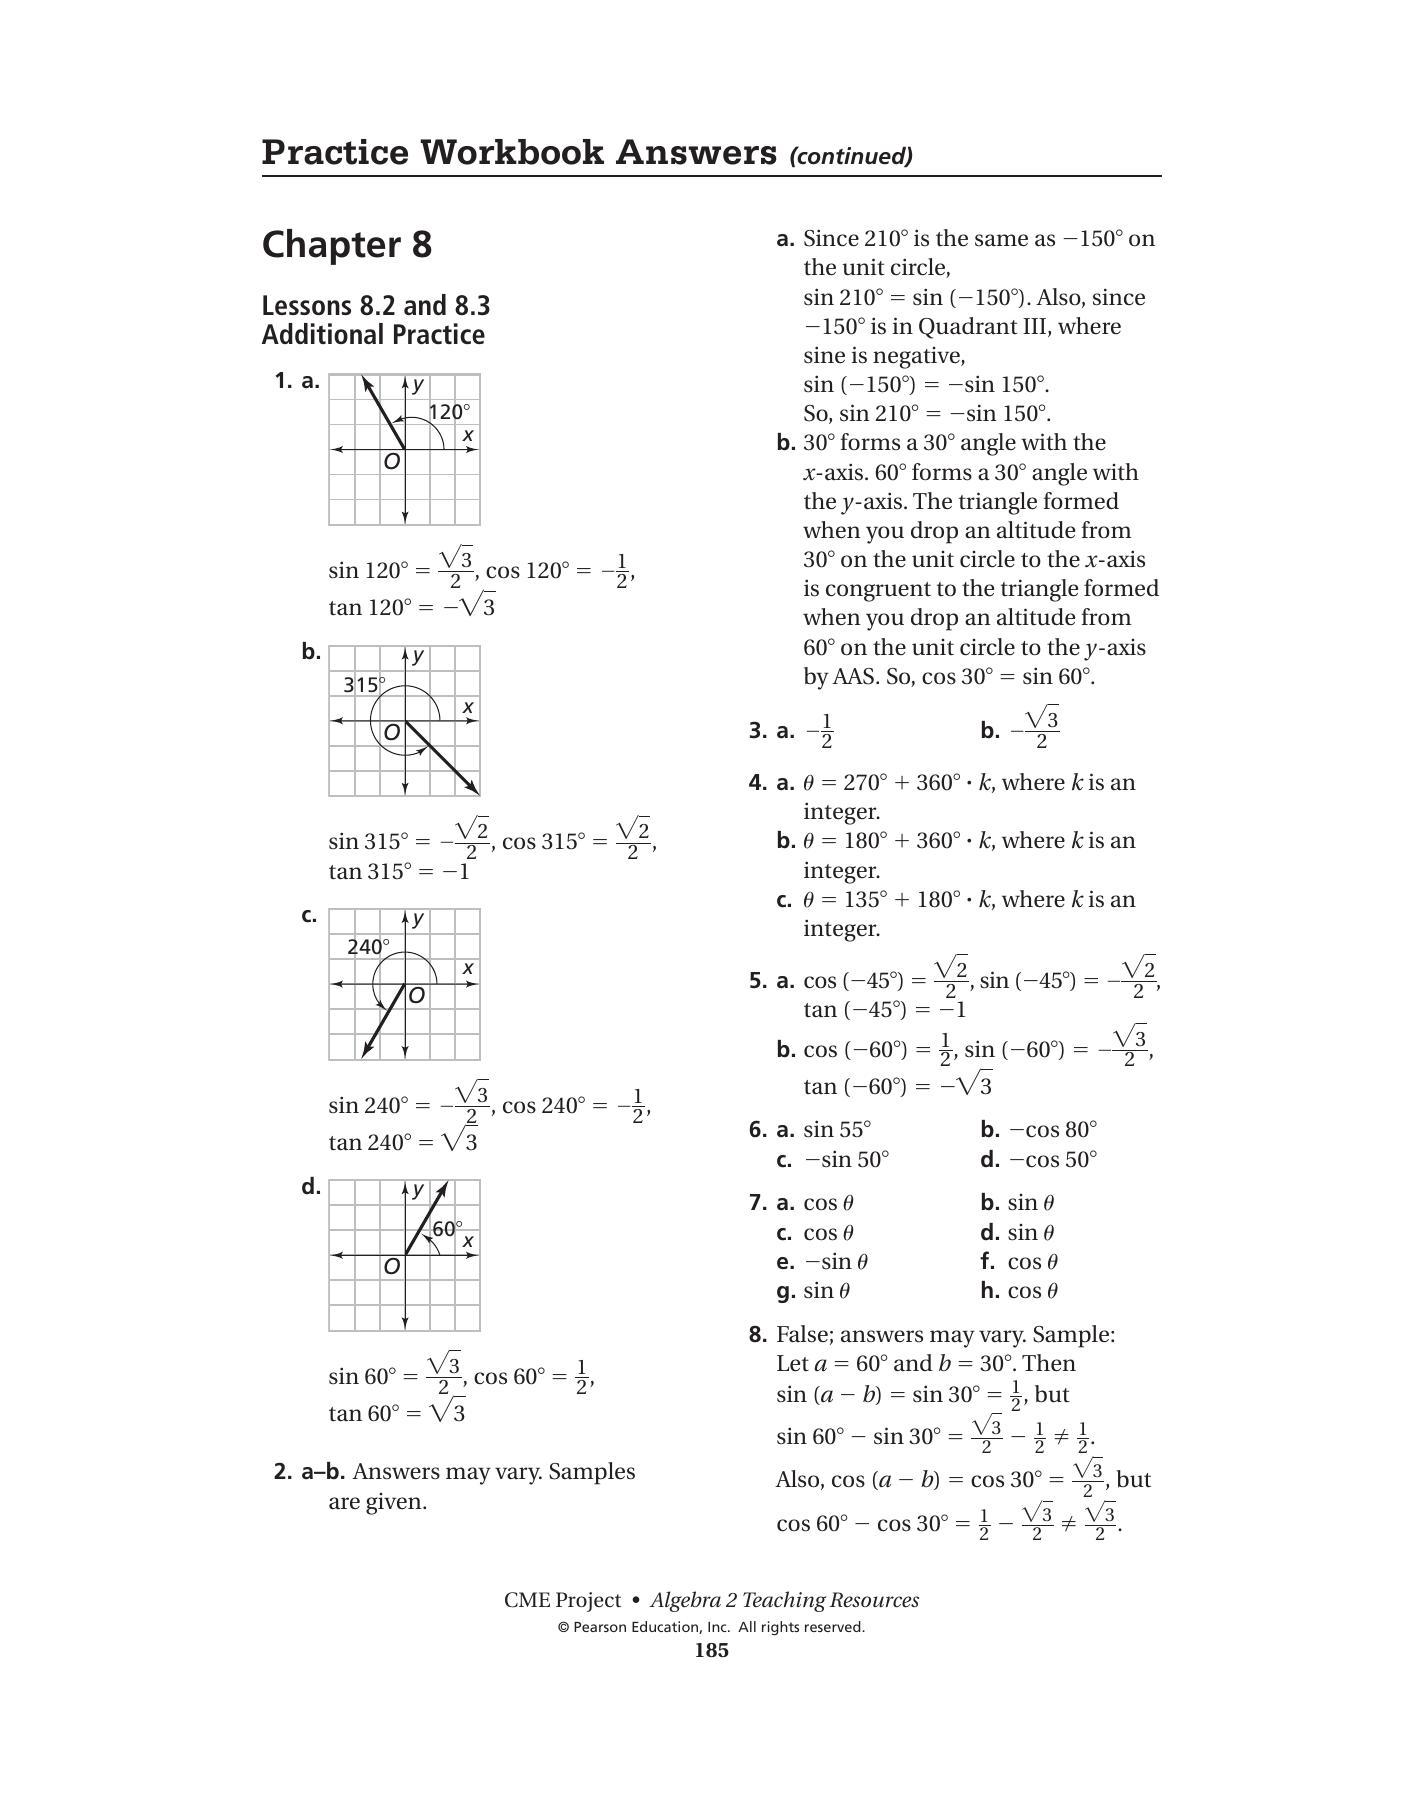 Bestseller: Pearson Algebra 2 Workbook Answers